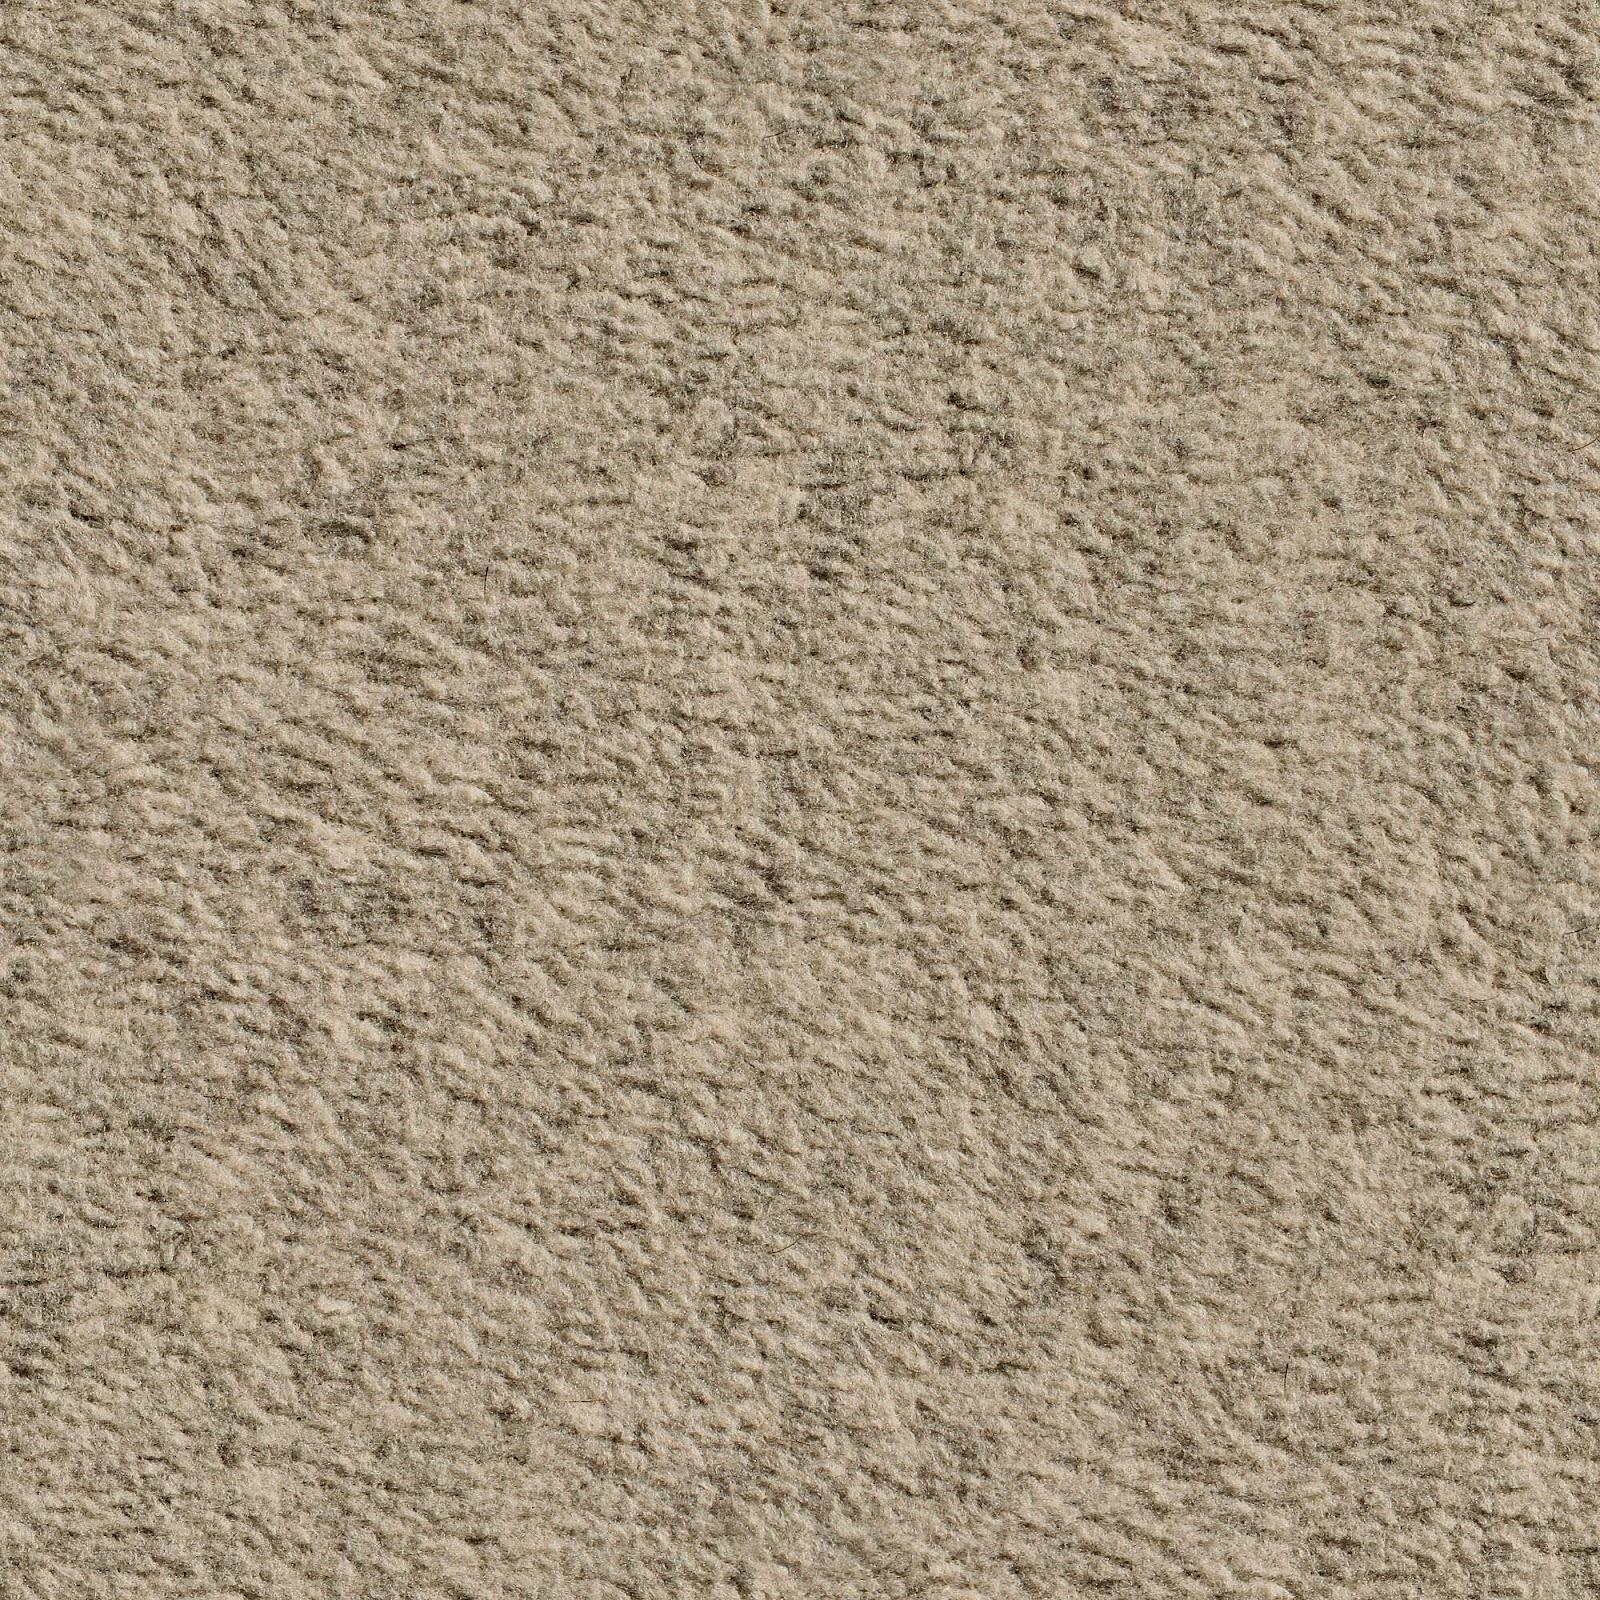 Tileable carpet texture for Carpet texture high resolution